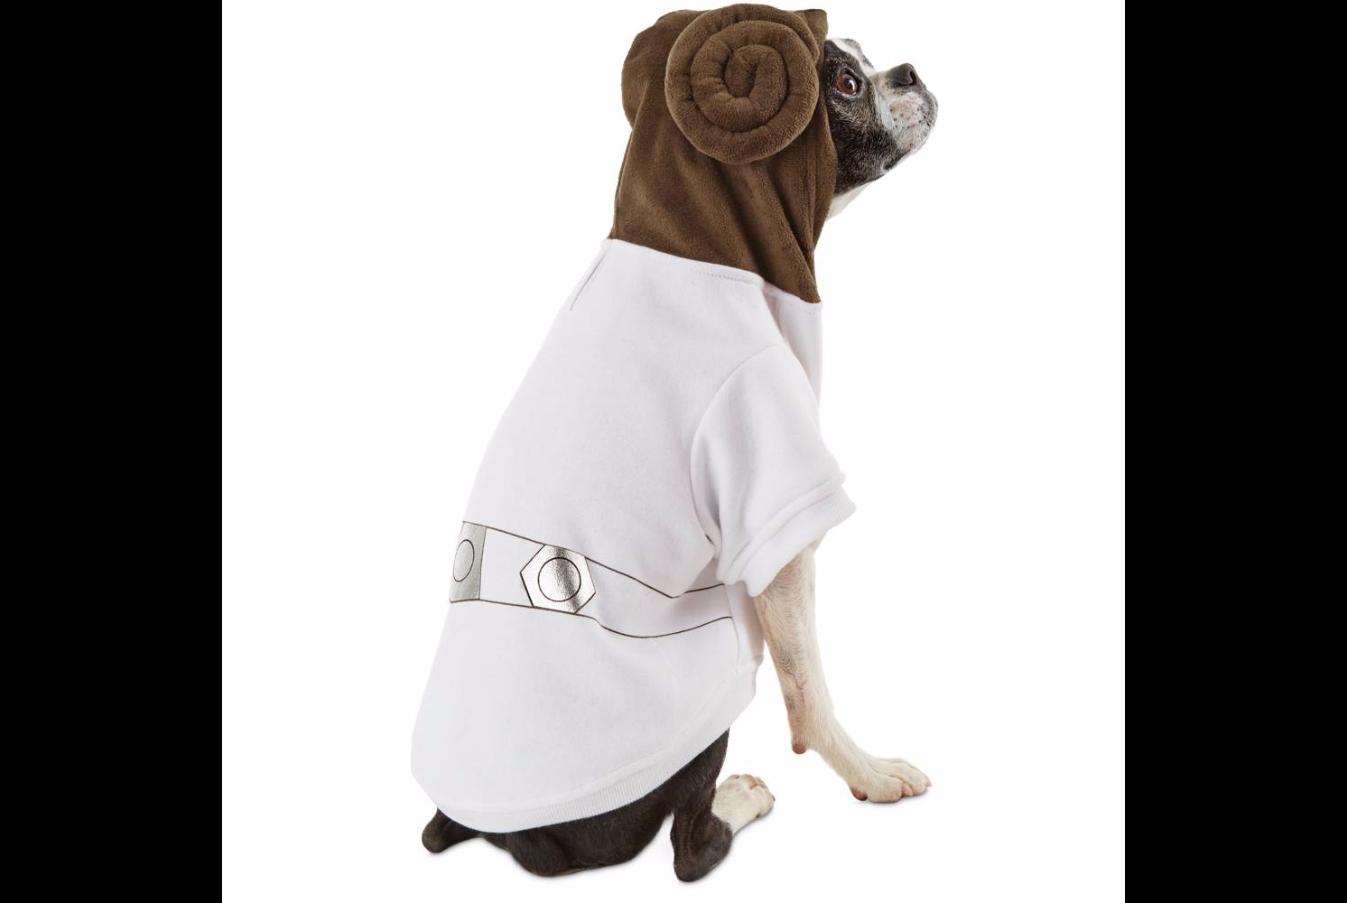 Thisperfect costume for intergalactic princesses